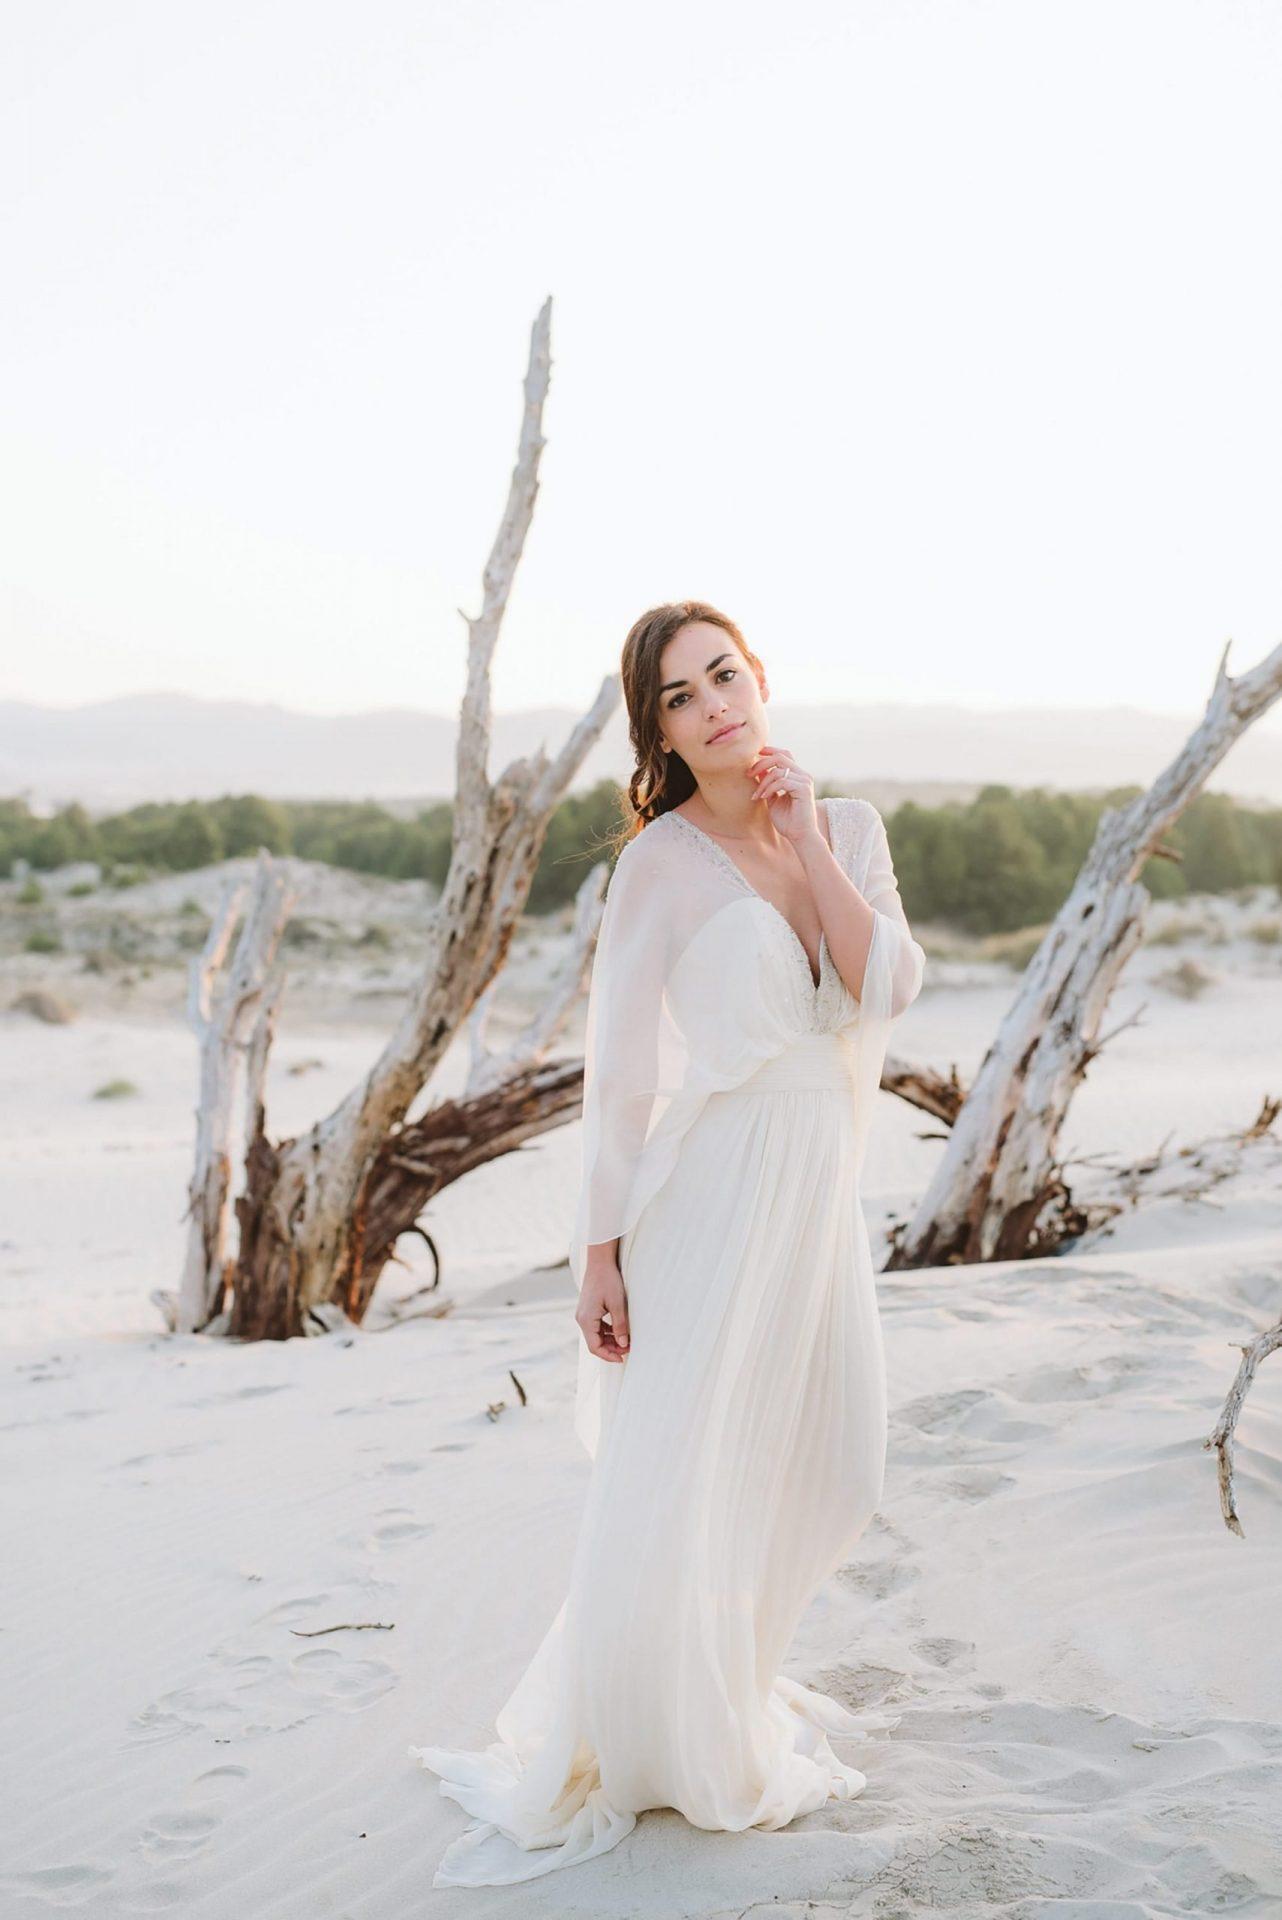 Elopement in Sardinia, the bride